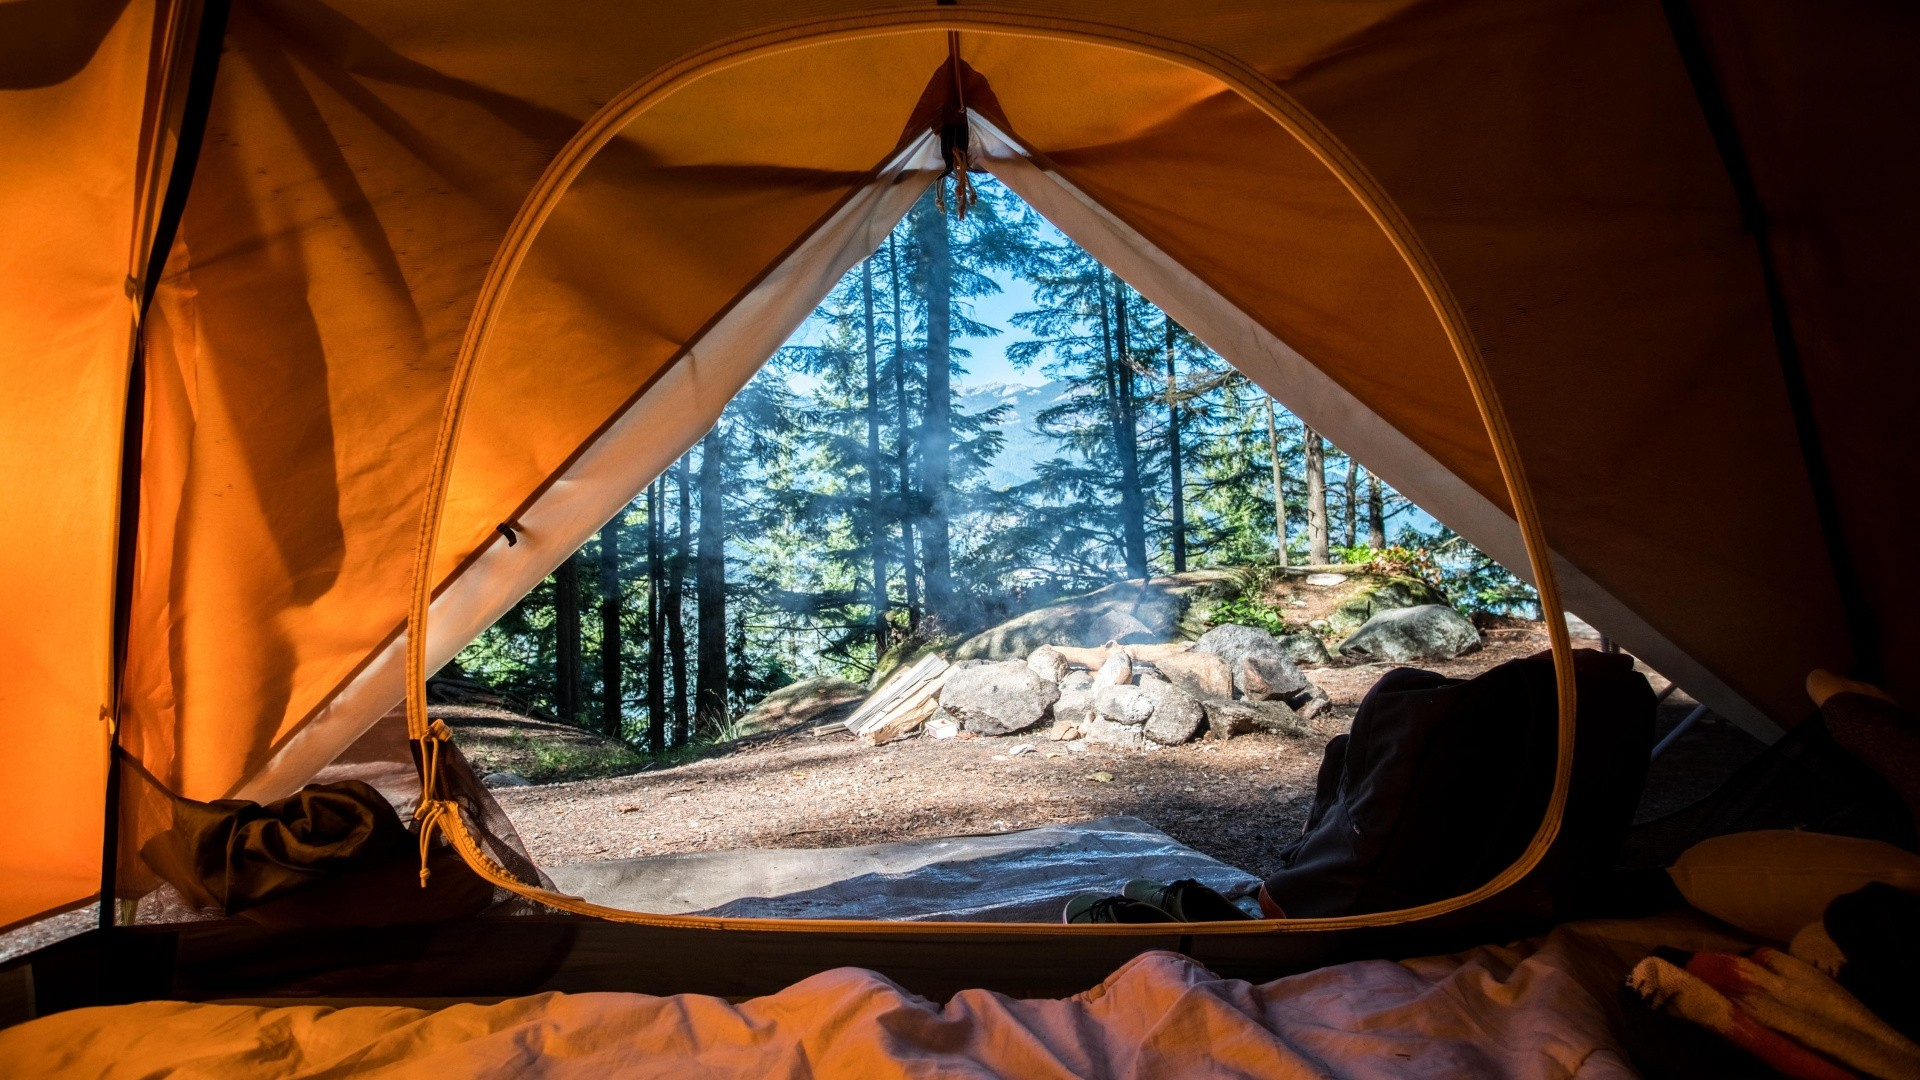 Camping PC Wallpaper HD